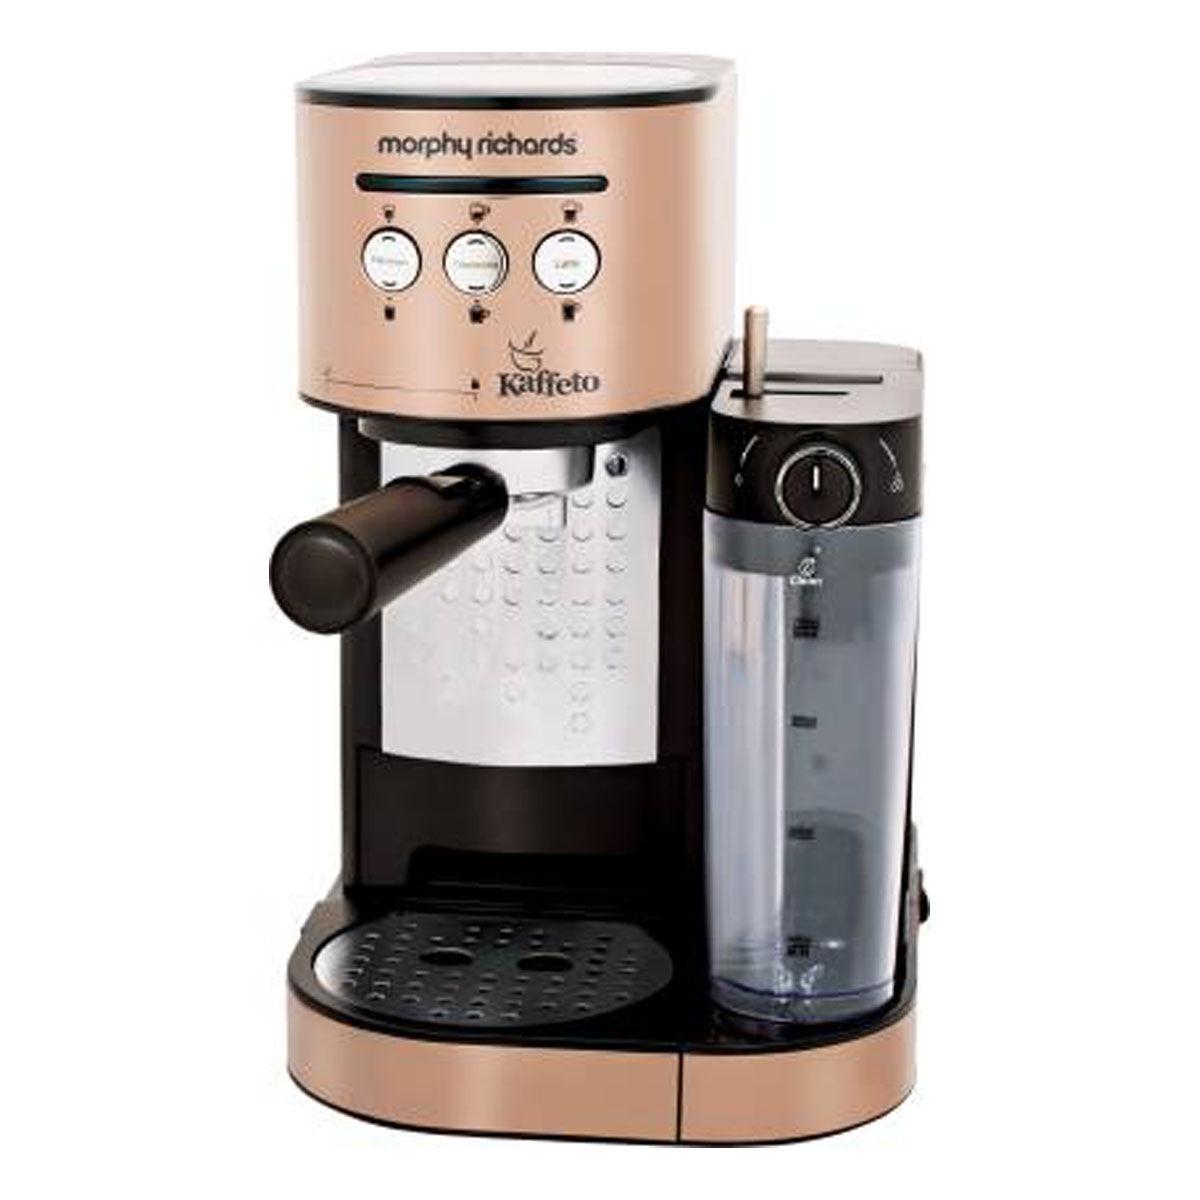 Morphy Richards Kaffeto 10 Cups Coffee Maker